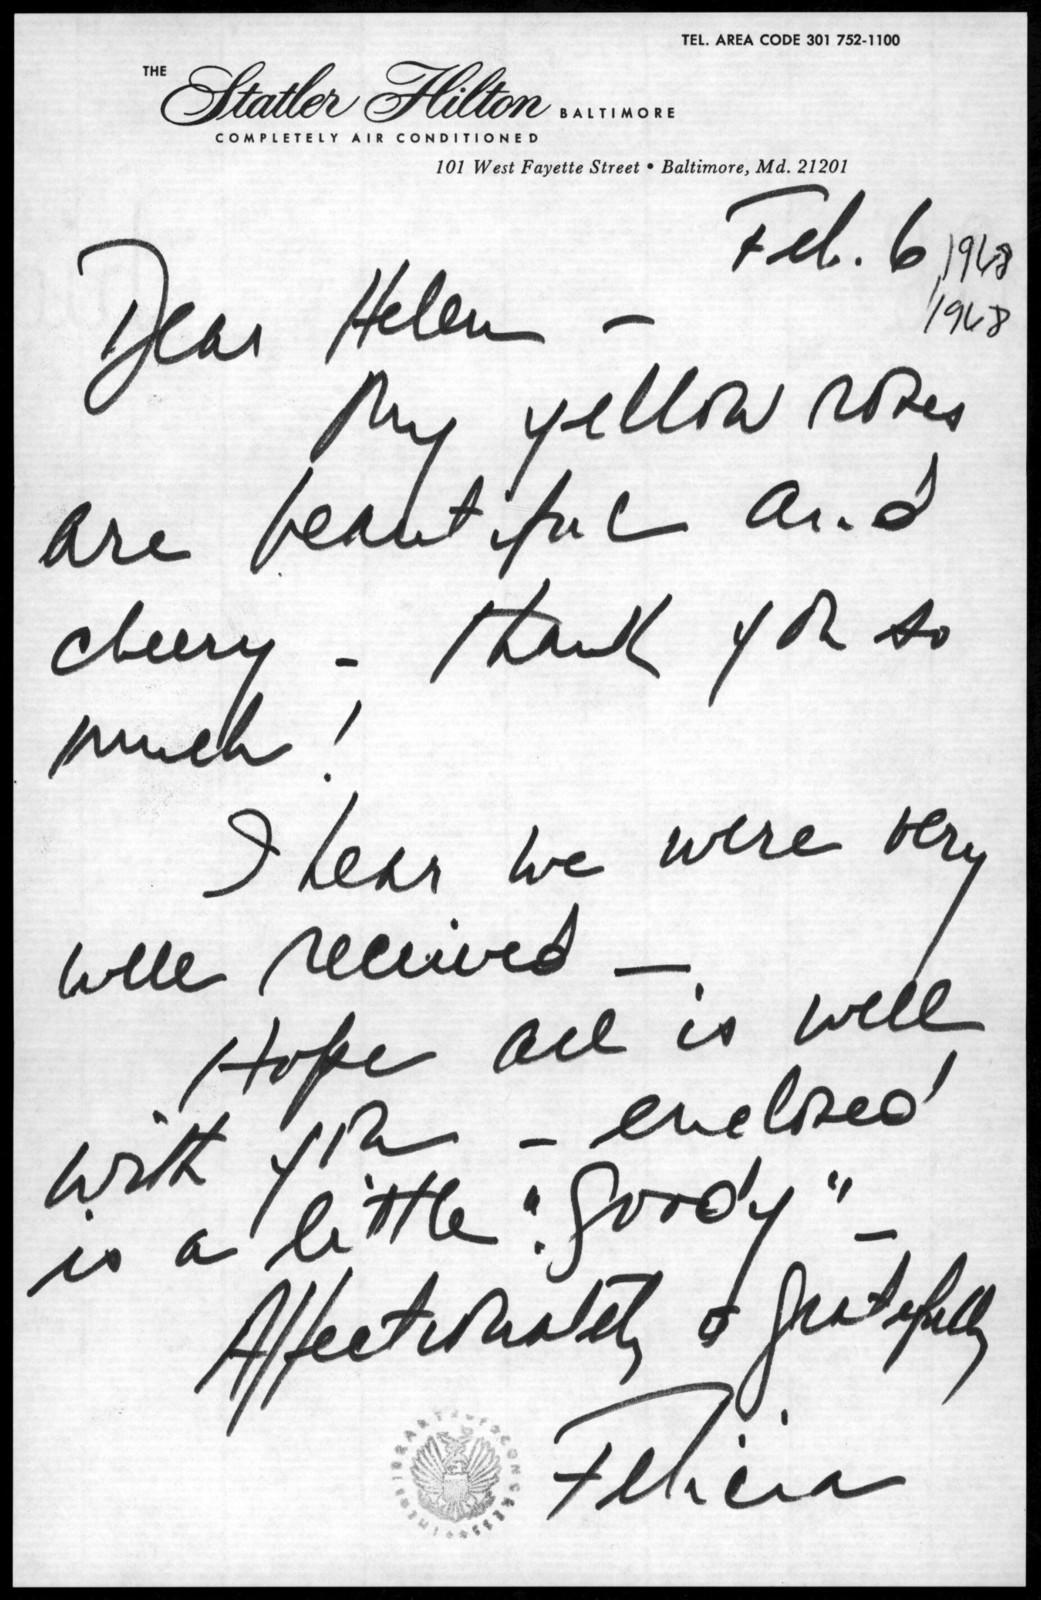 Letter from Felicia Bernstein to Helen Coates, February 6, 1968